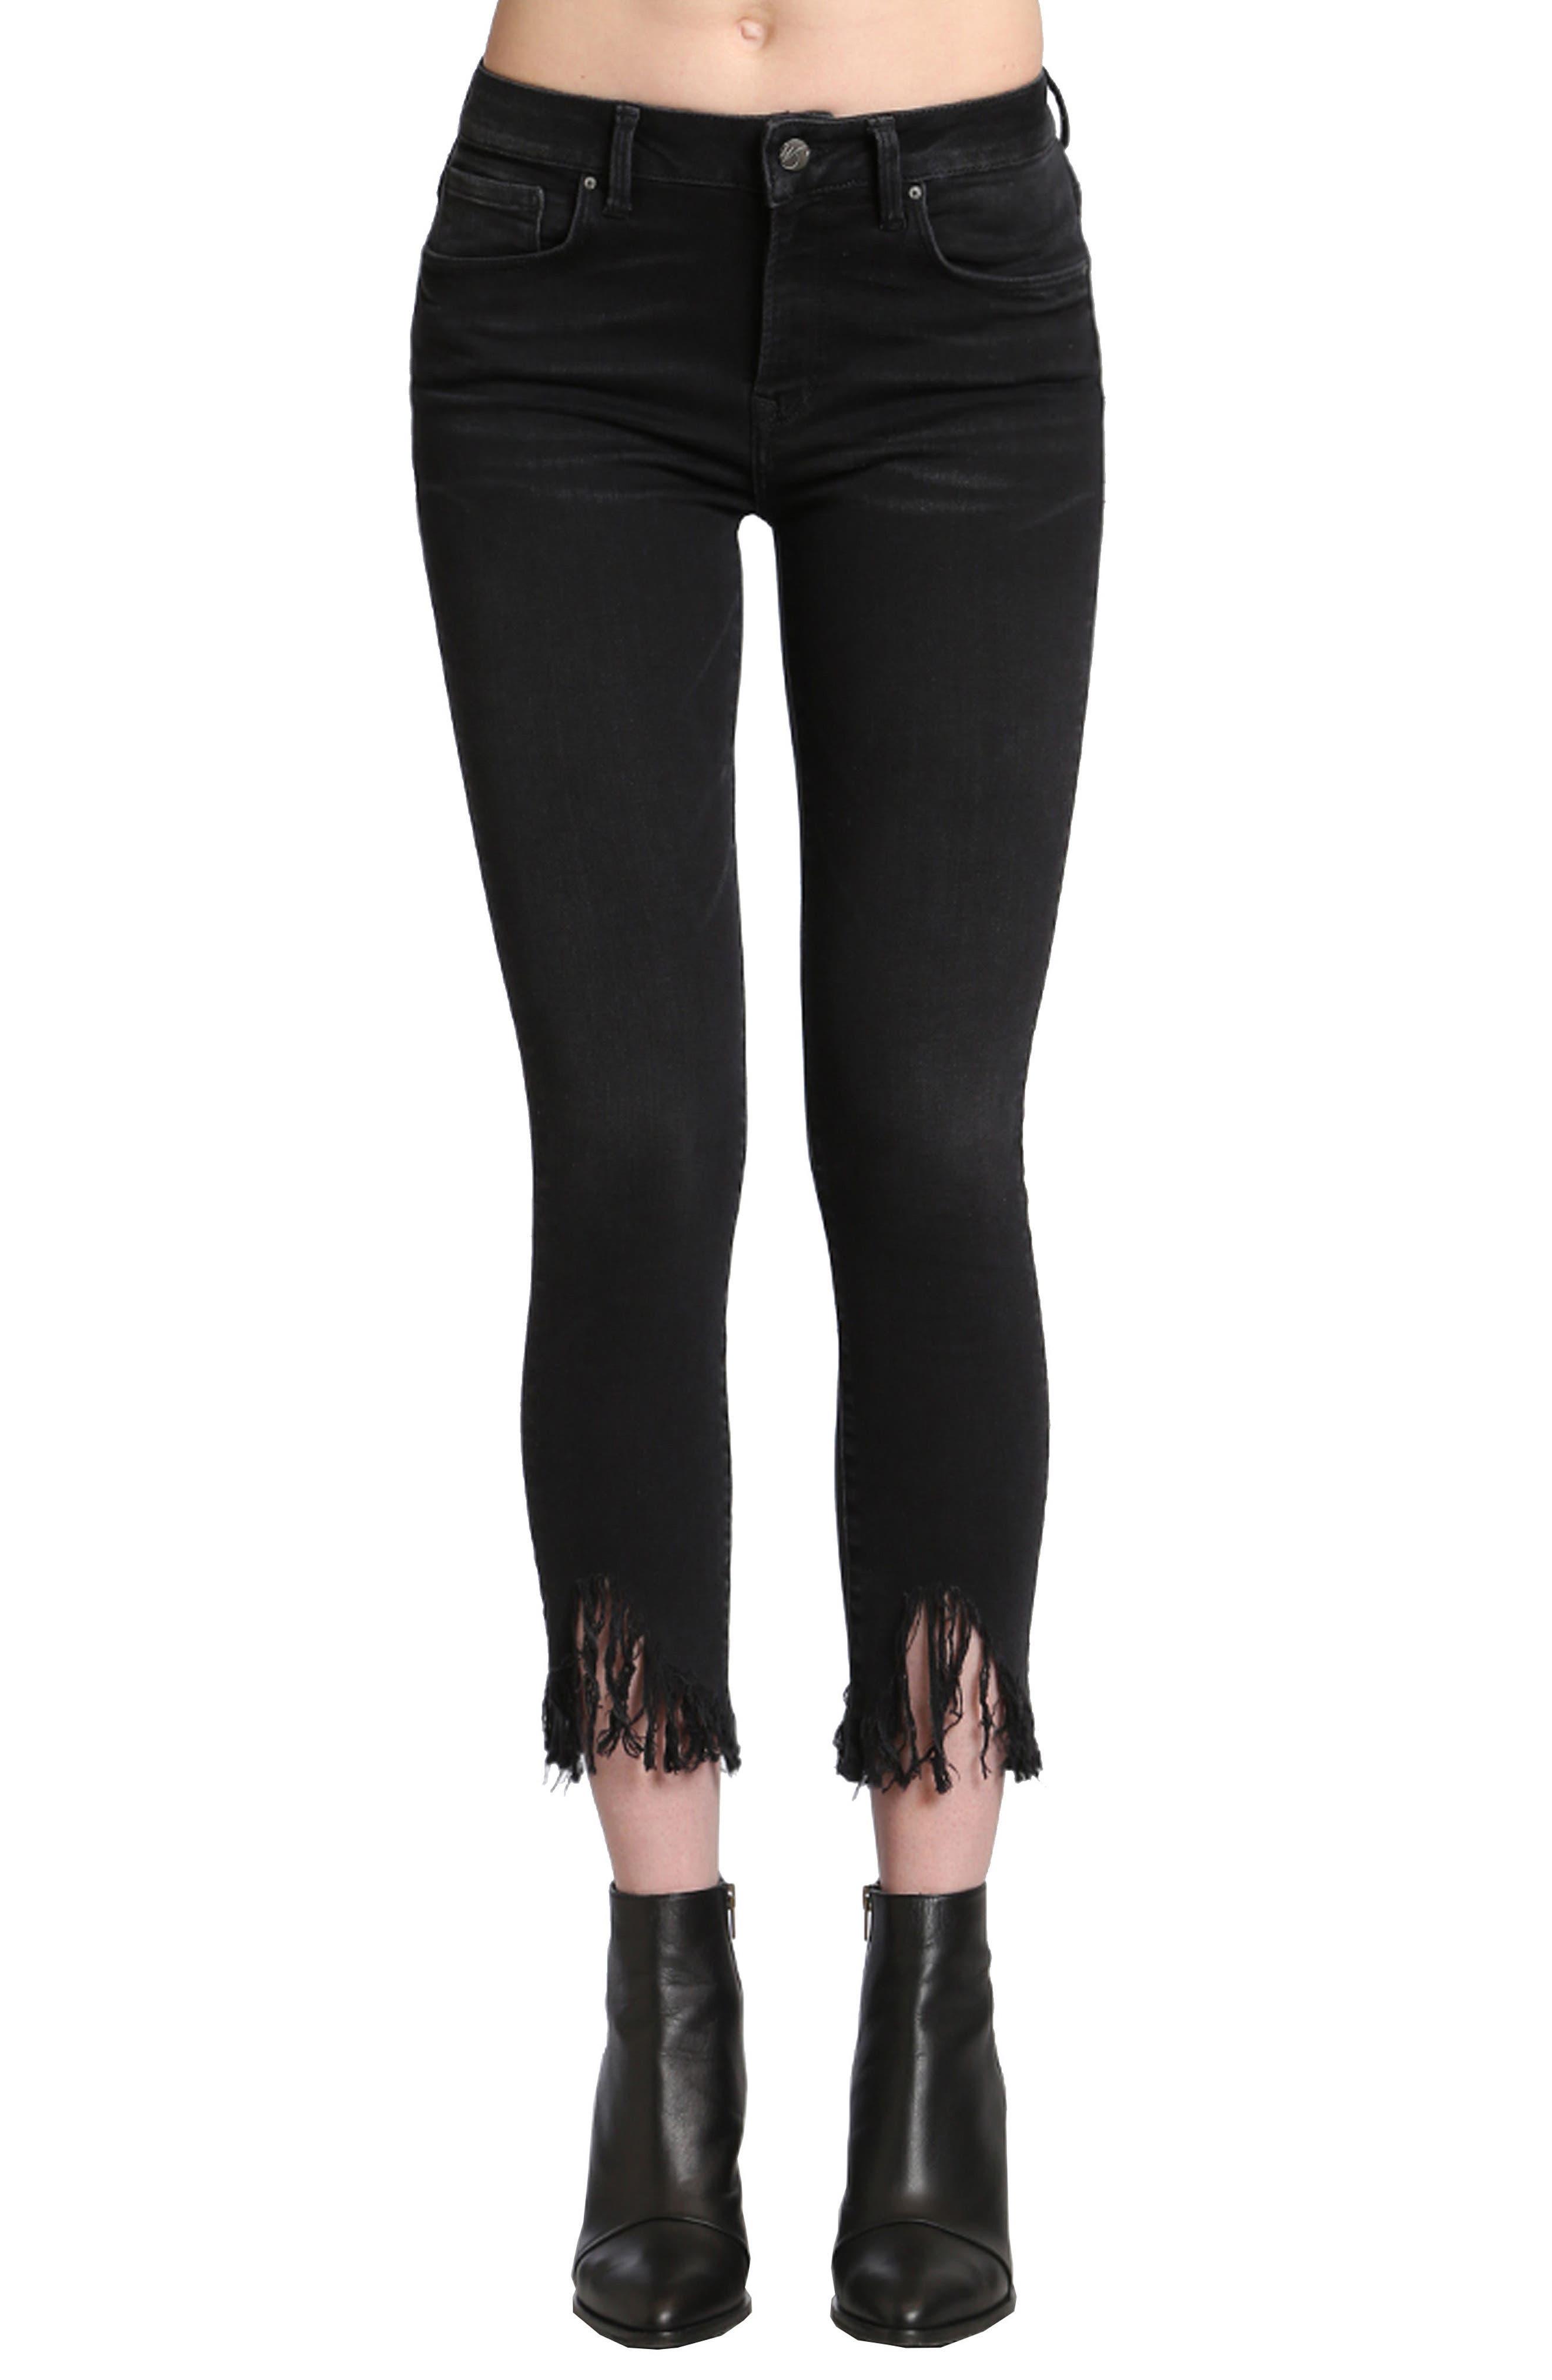 Alternate Image 1 Selected - Mavi Jeans Tess Fringe Skinny Crop Jeans (Smoke)